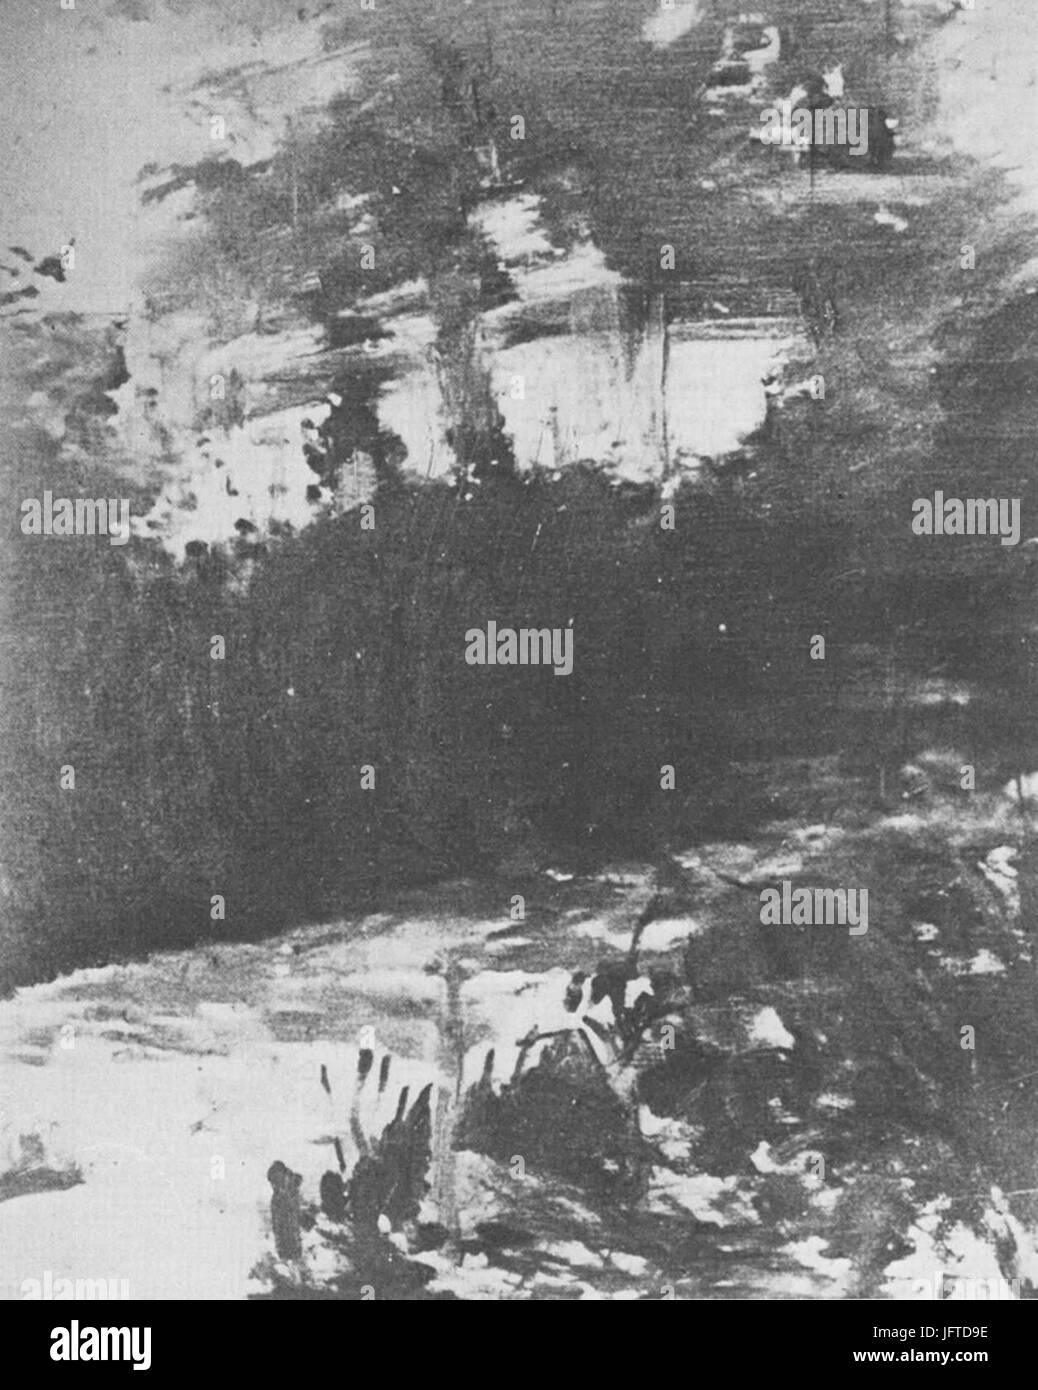 Édouard Manet - Une allée de jardin de Rueil (RW 404) - Stock Image